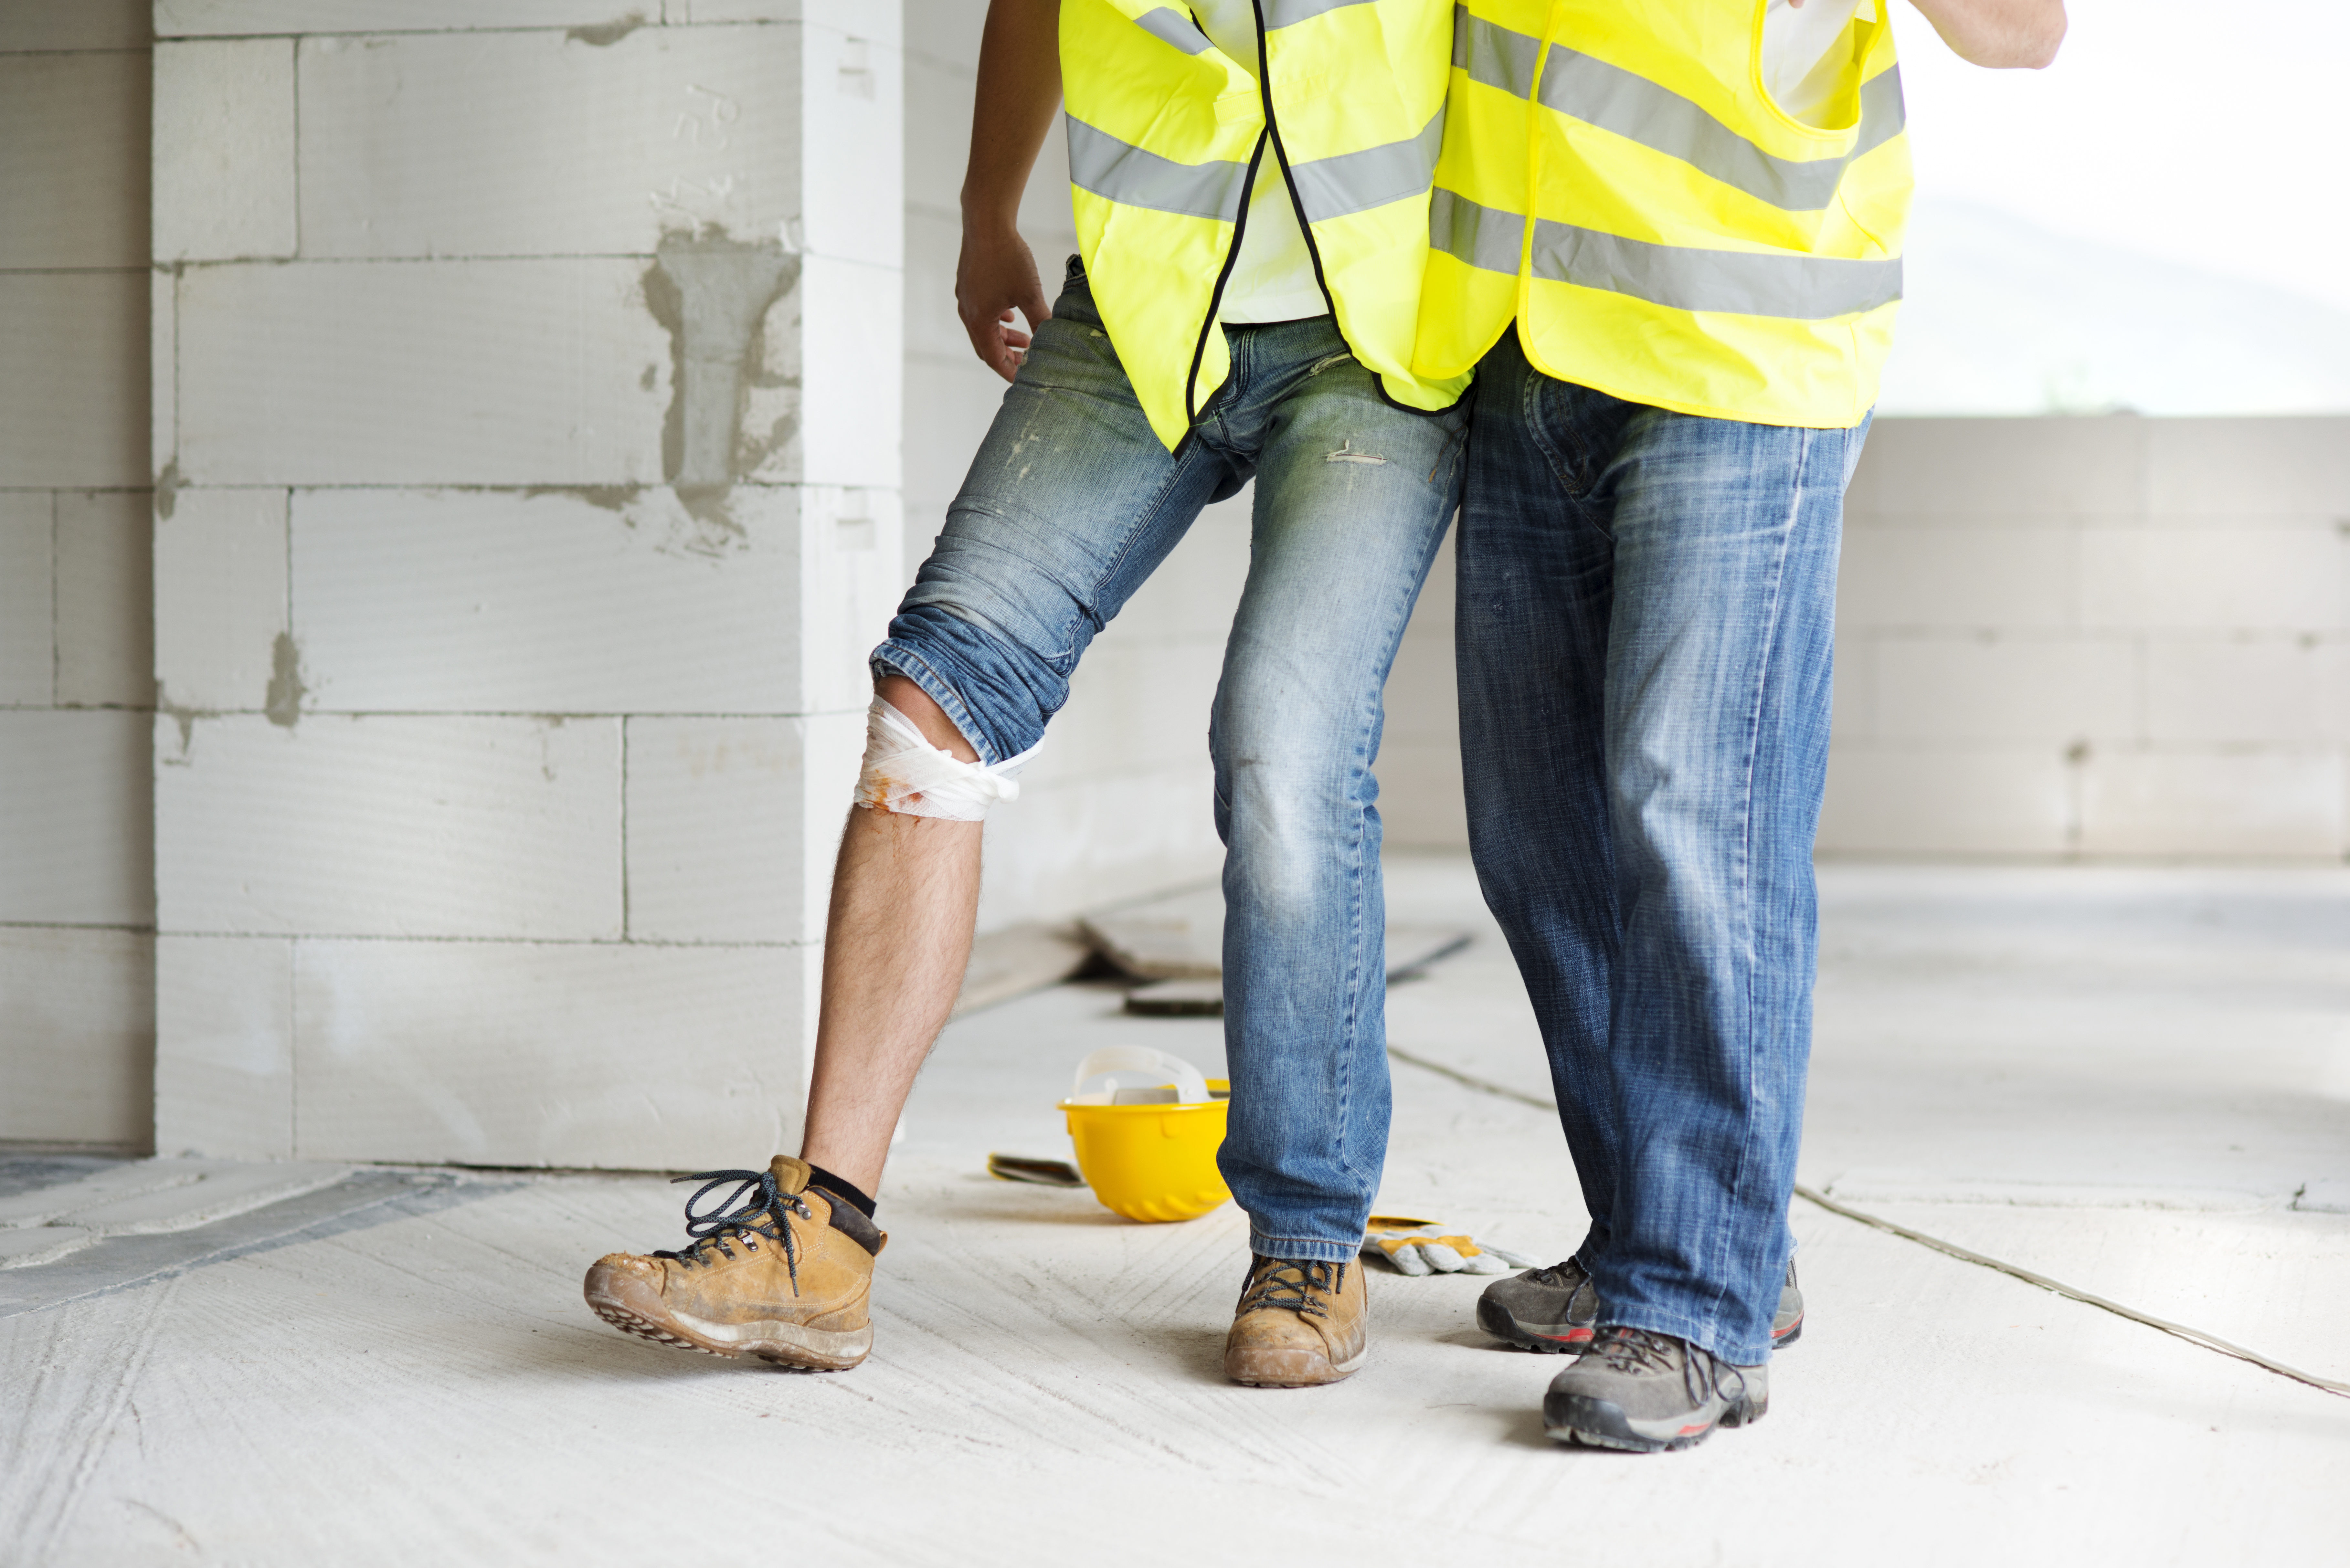 work injury, worker injury